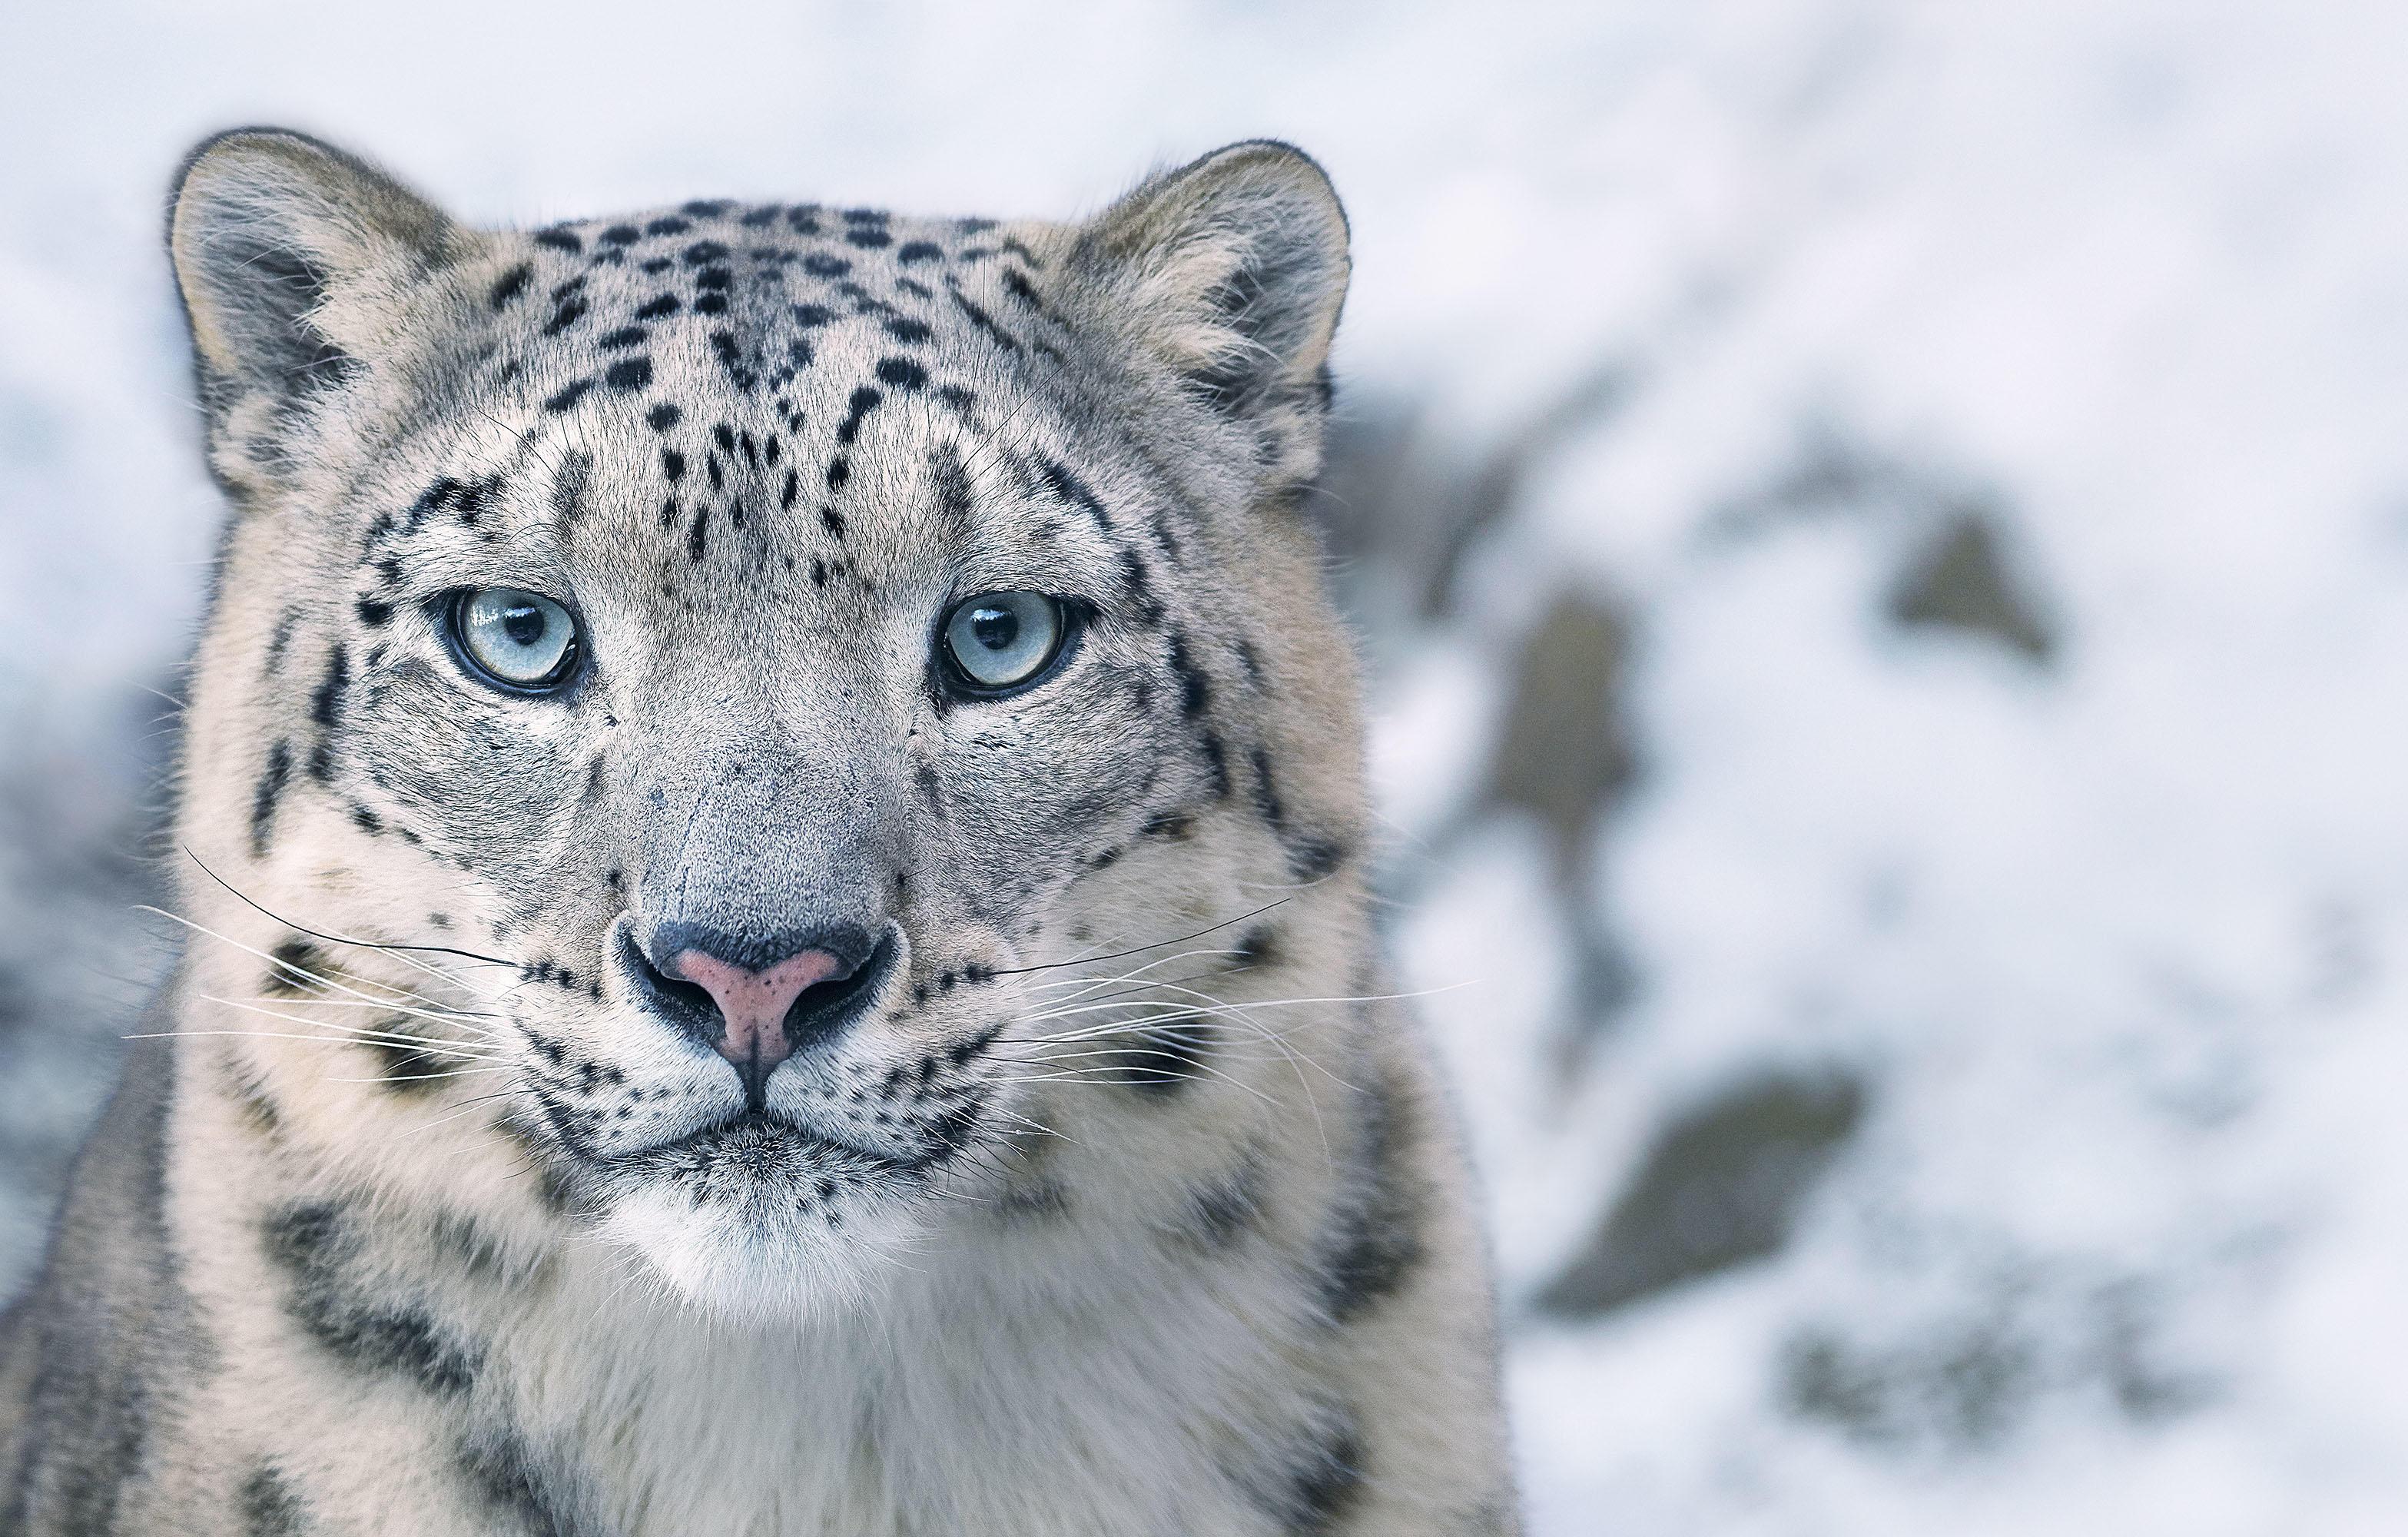 Tim_Flach_Snow Leopard.jpg